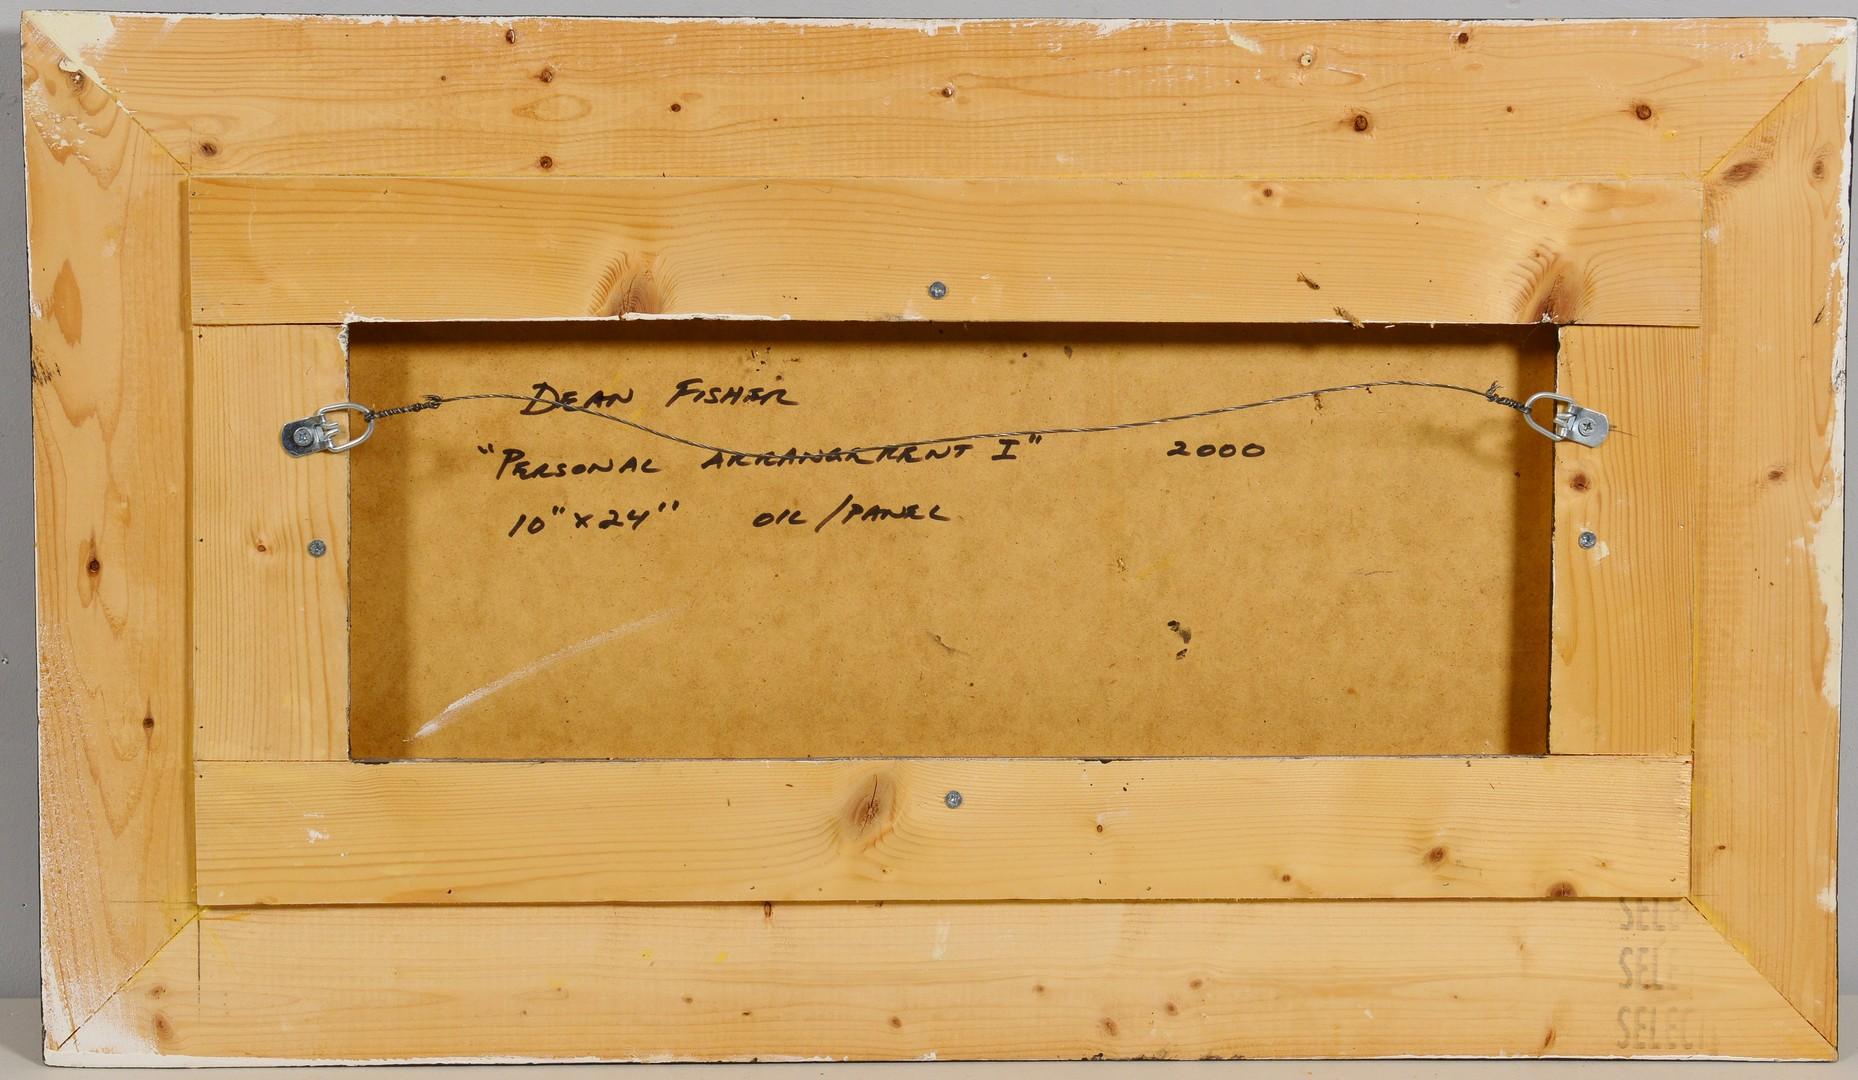 Lot 4010163: Dean Fisher Oil on Board Still Life